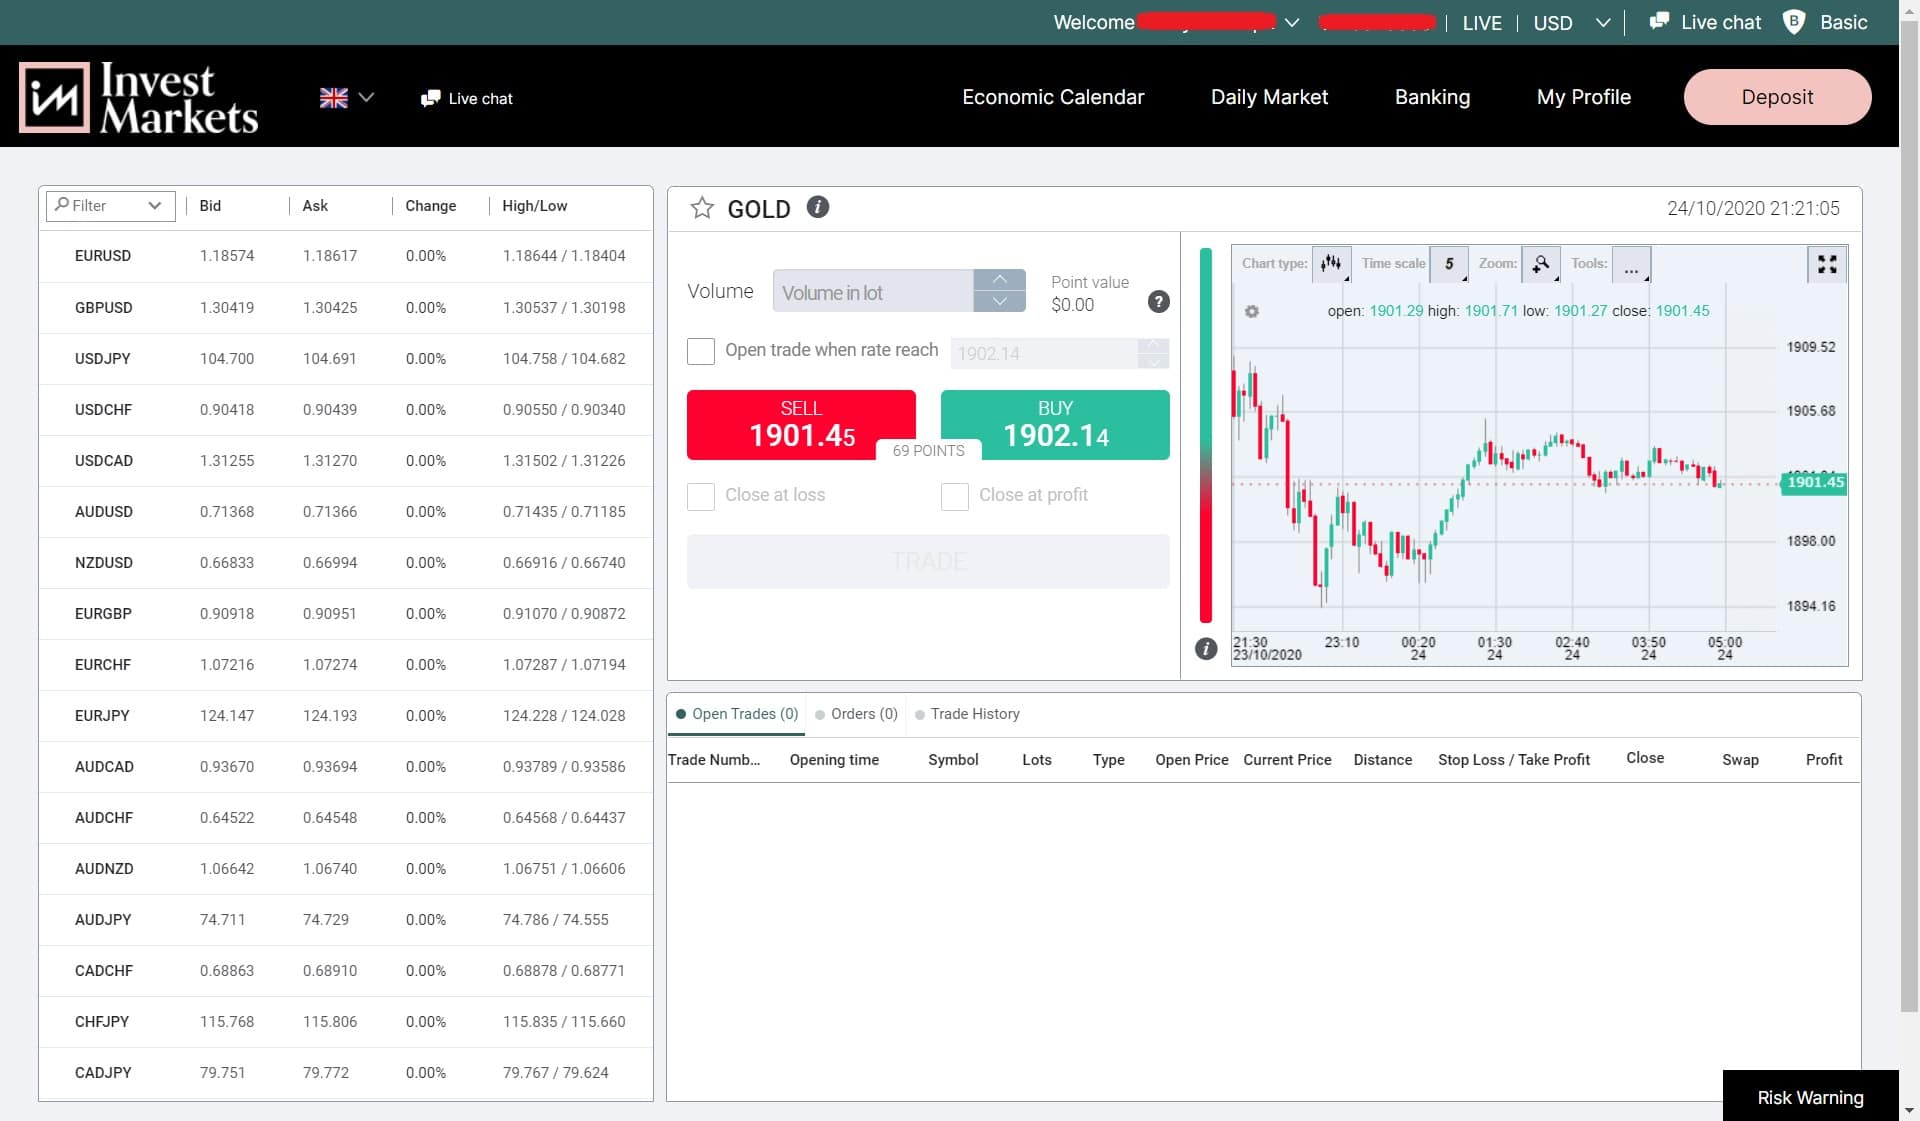 Gold trading on InvestMarkets' platform